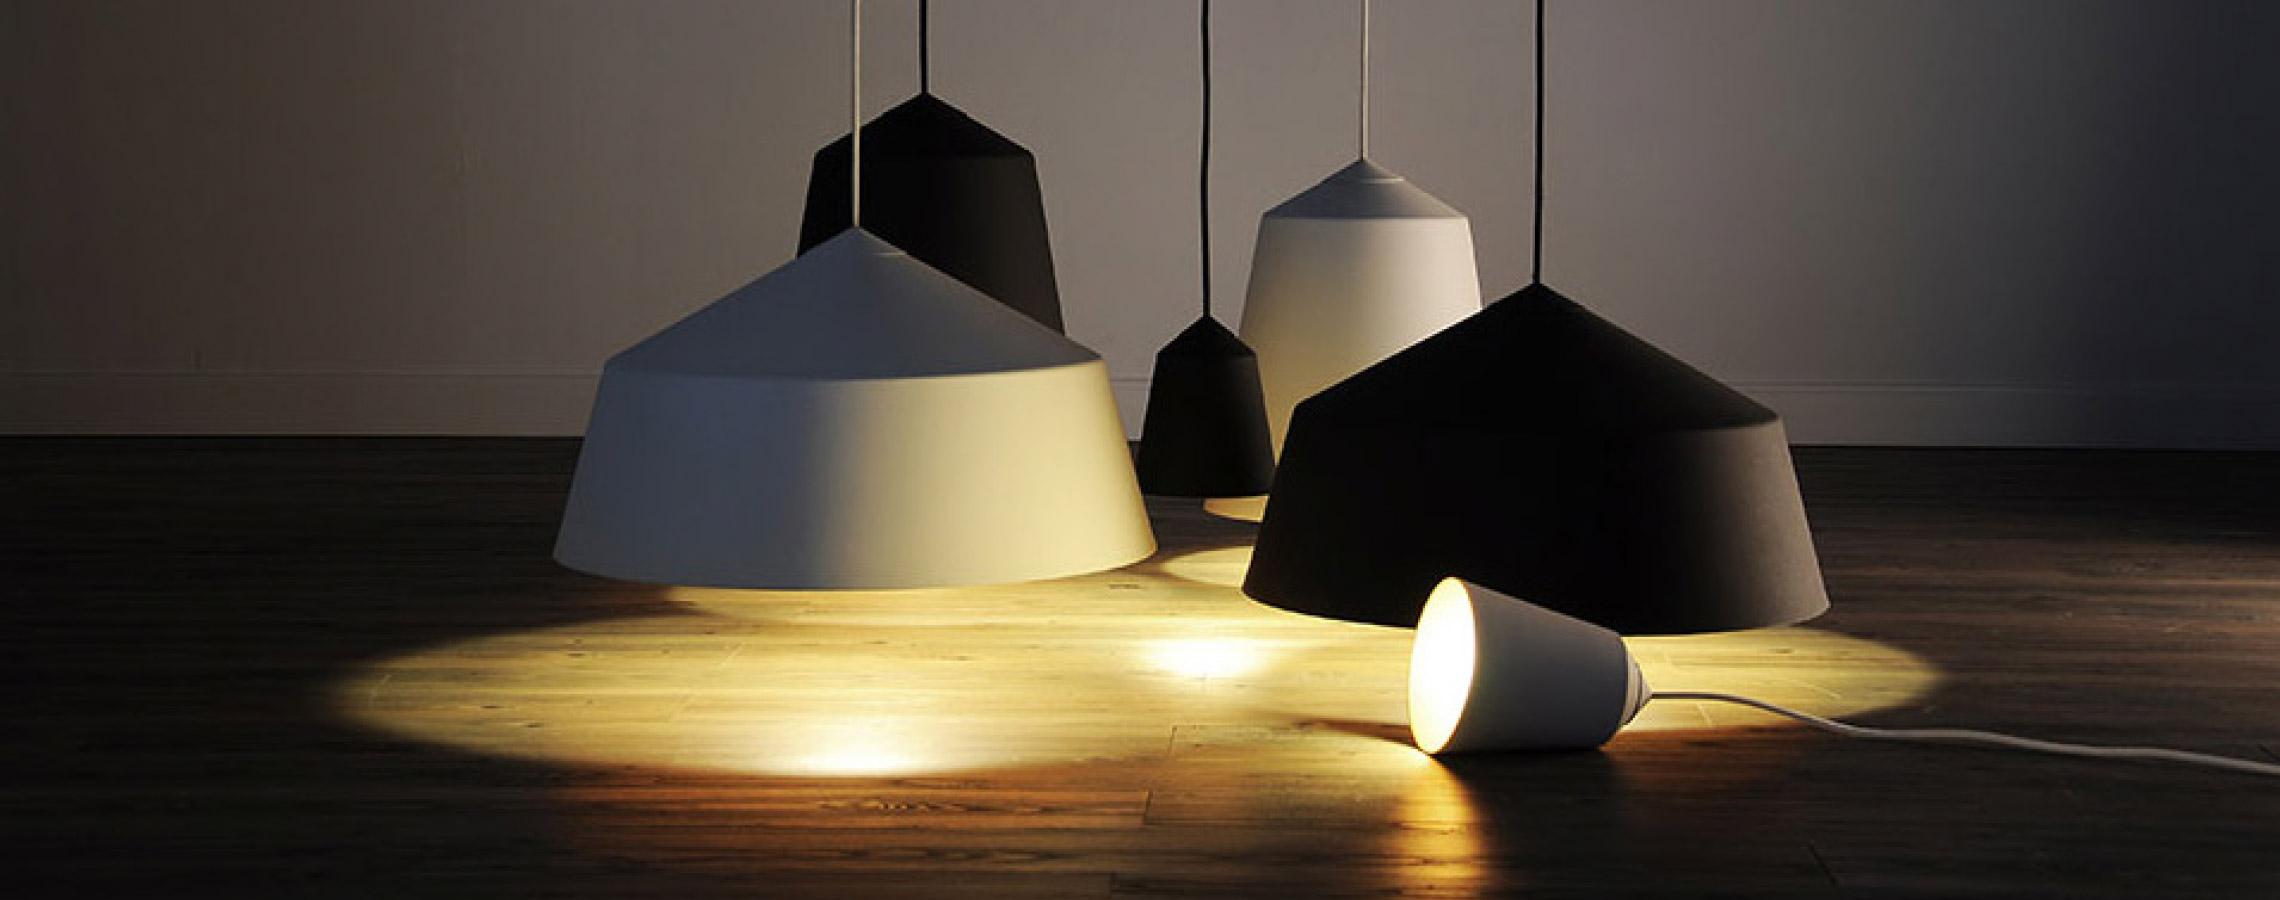 Innermost-Circus-pendant-light-by-Corinna-Warm-Lifestyle-Image